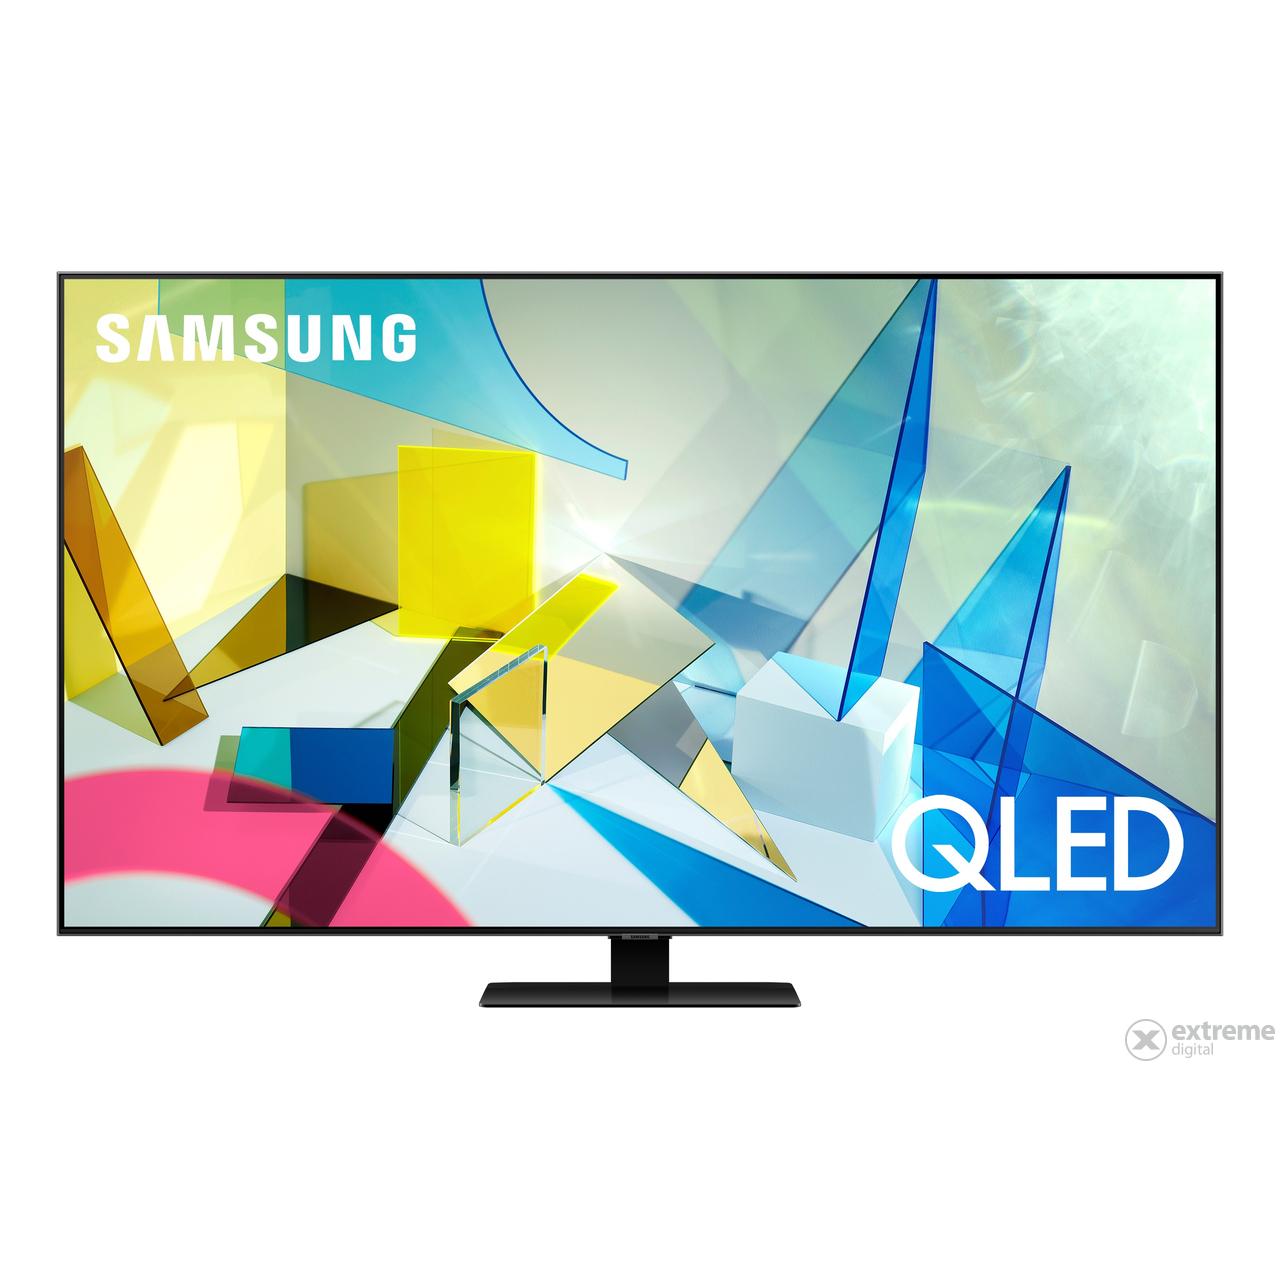 [eDigital] Black Friday - Bestpreise | z.B. Samsung QE55Q80T UHD QLED SMART LED